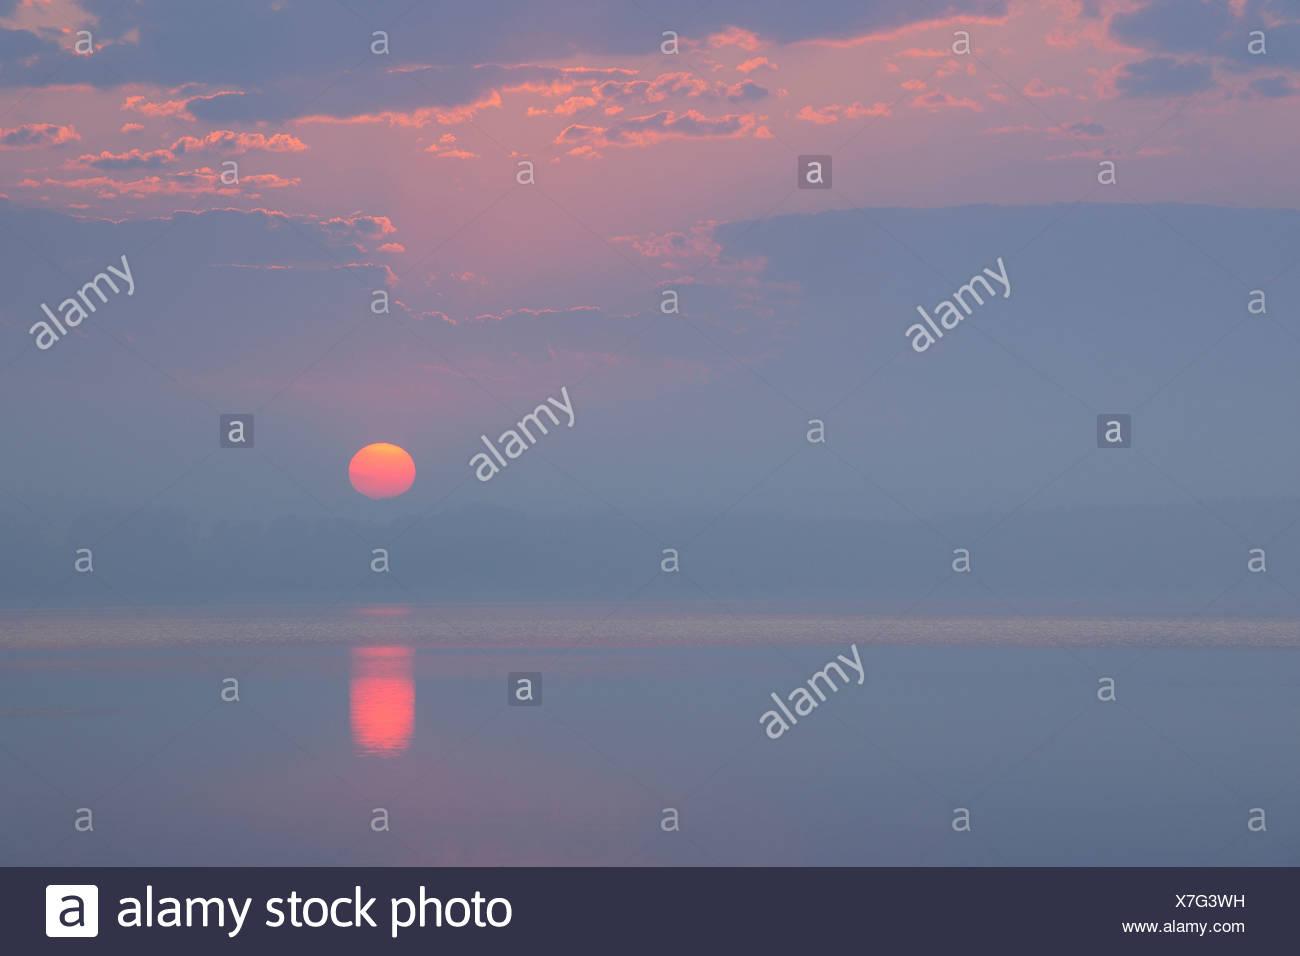 Germany, Mecklenburg-Vorpommern, Mecklenburger Seenplatte, Plau am See, View of sunrise with reflection in lake - Stock Image